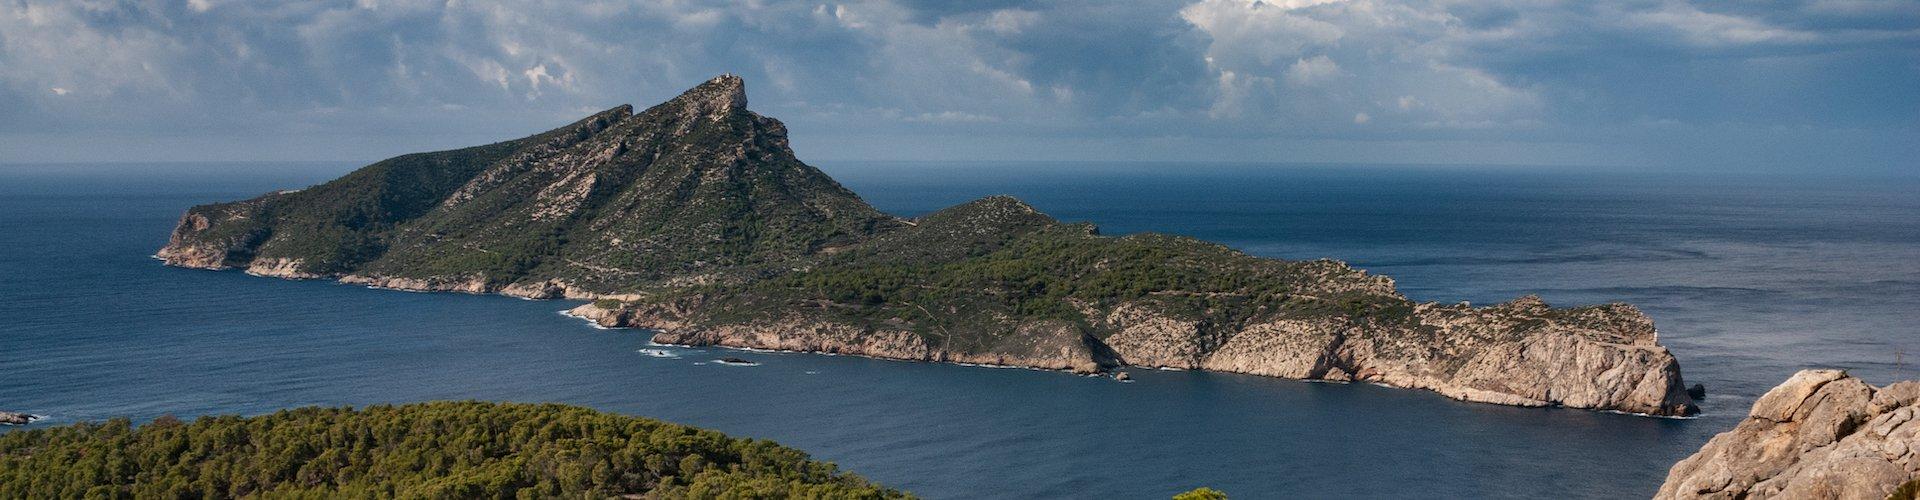 Ausflugsziel Dracheninsel Dragonera